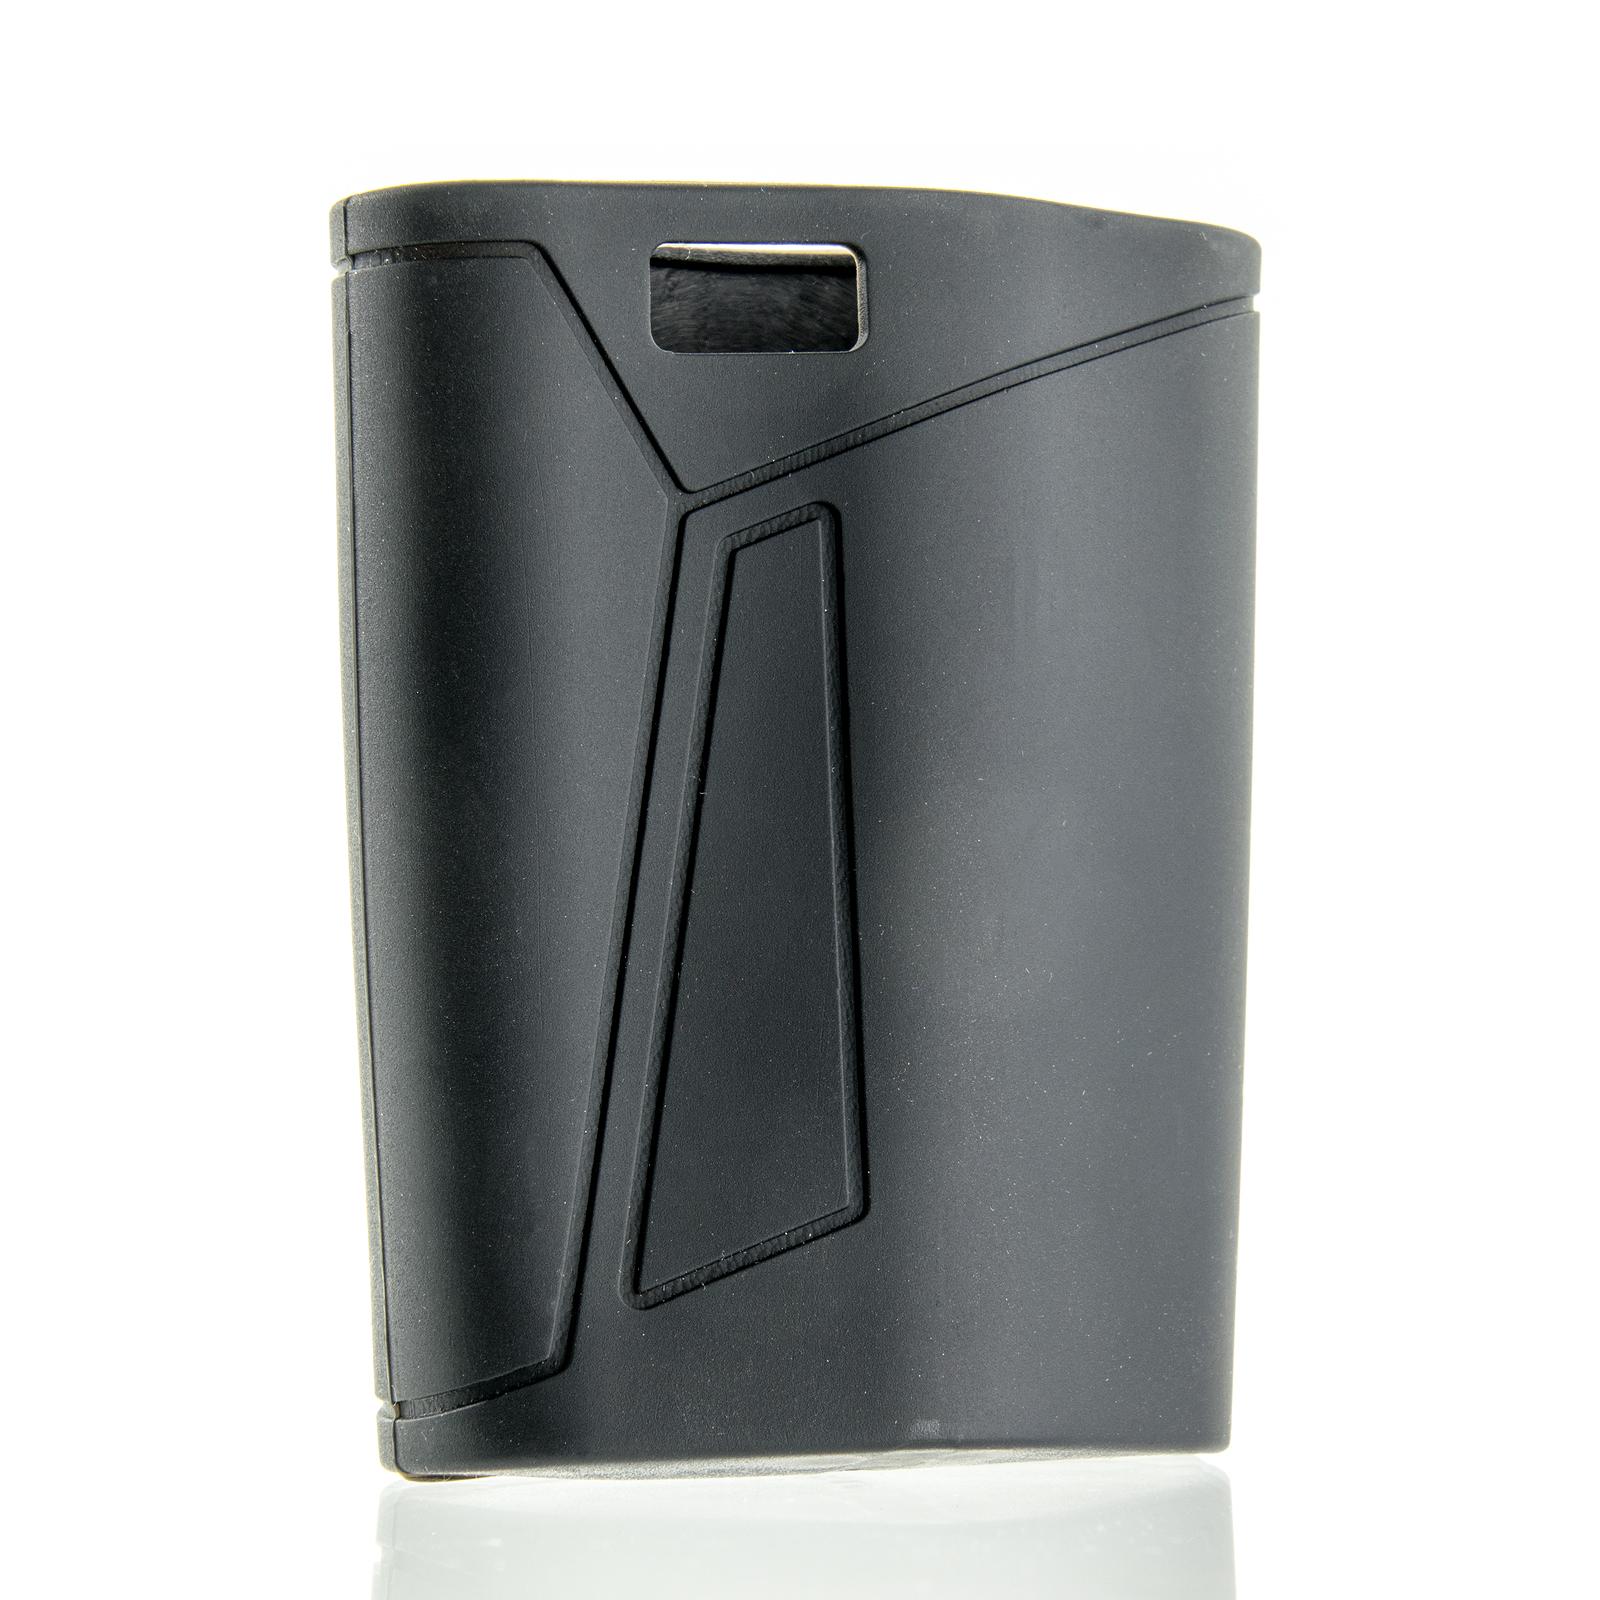 silikon schutzh lle f r smok gx350 h llen f r akkutr ger zubeh r e zigarette kaufen. Black Bedroom Furniture Sets. Home Design Ideas